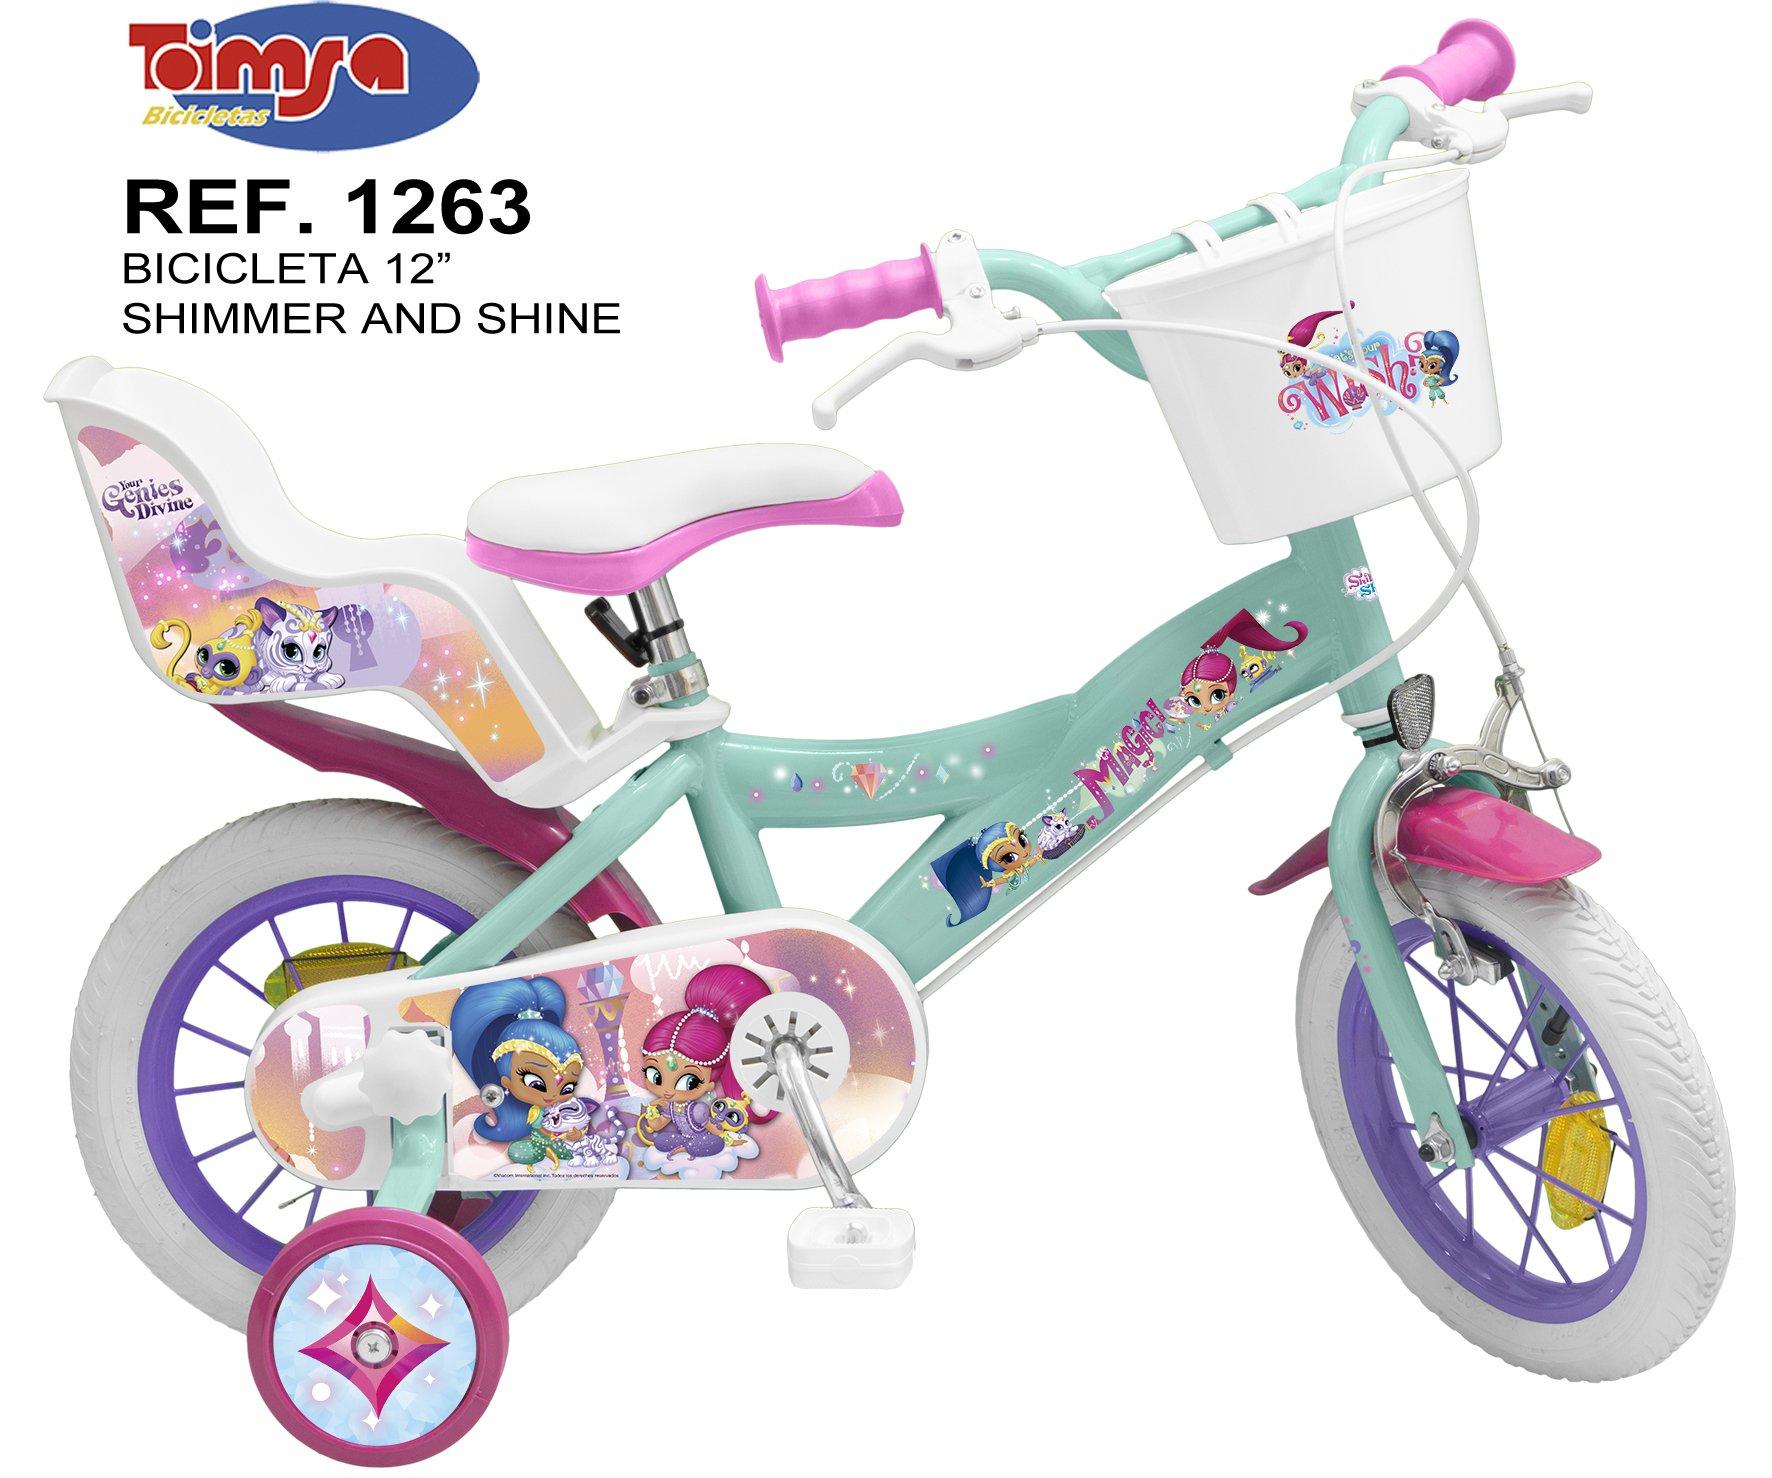 Bicicleta Shimmer and Shine 12 pulgadas